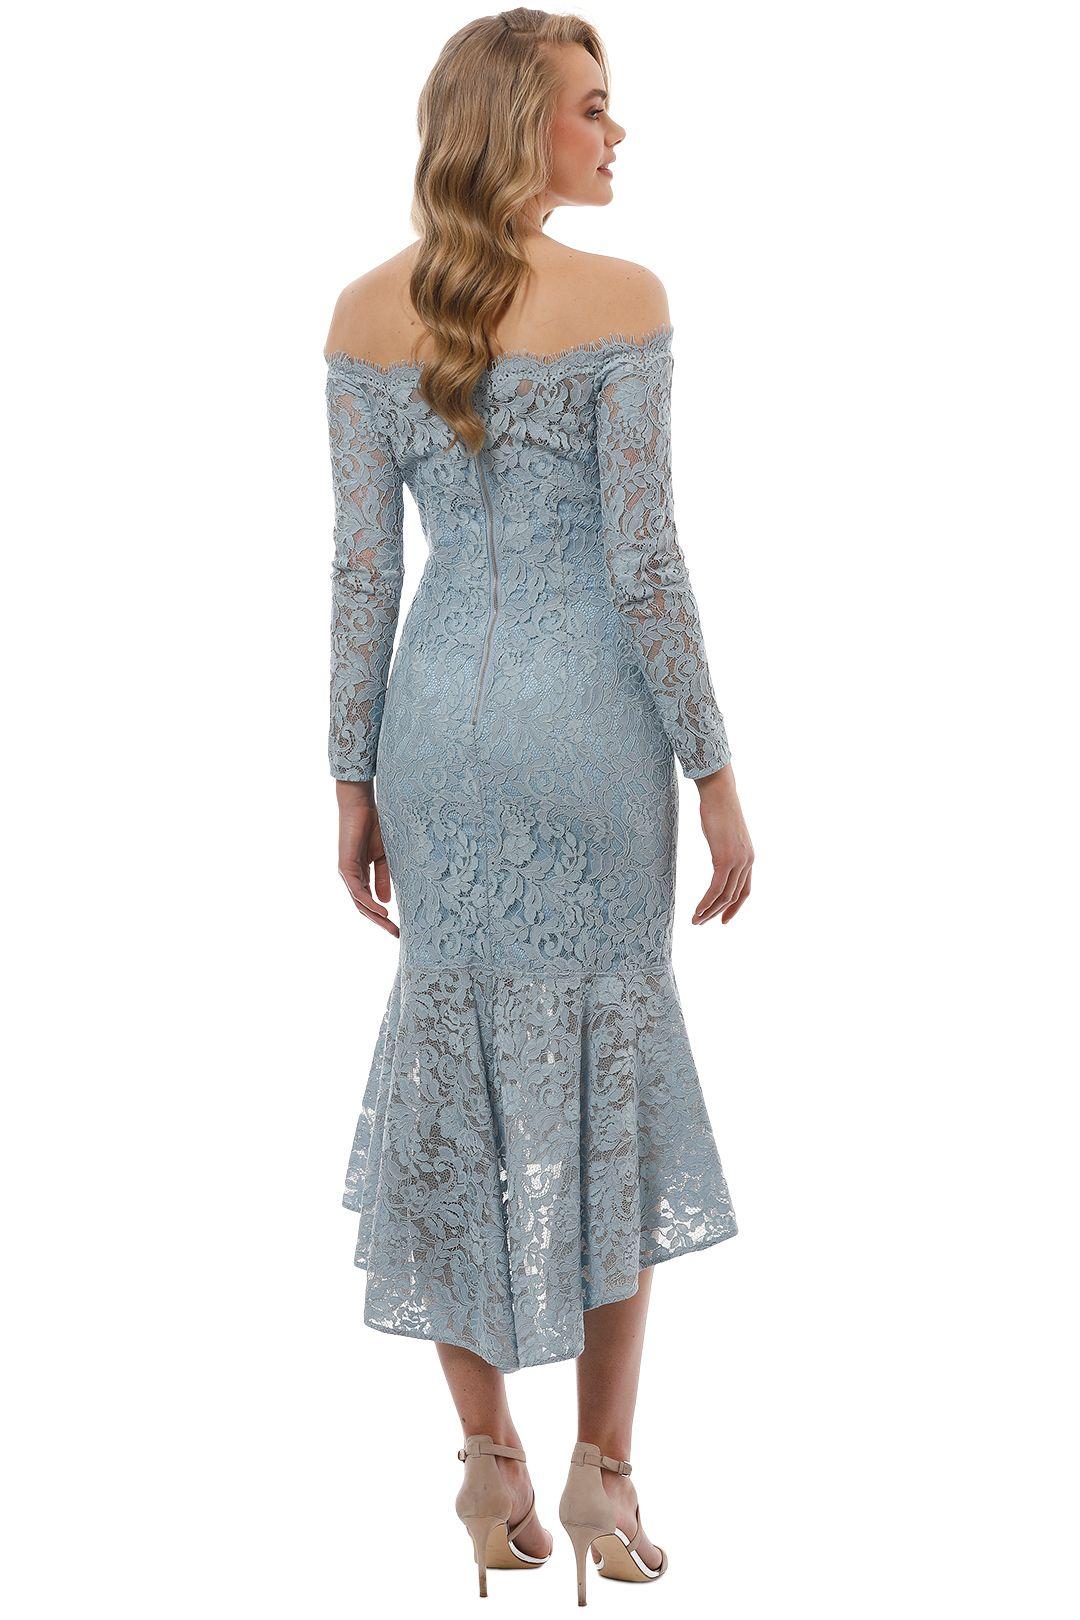 Rodeo Show - Abella Lace Dress - Blue - Back